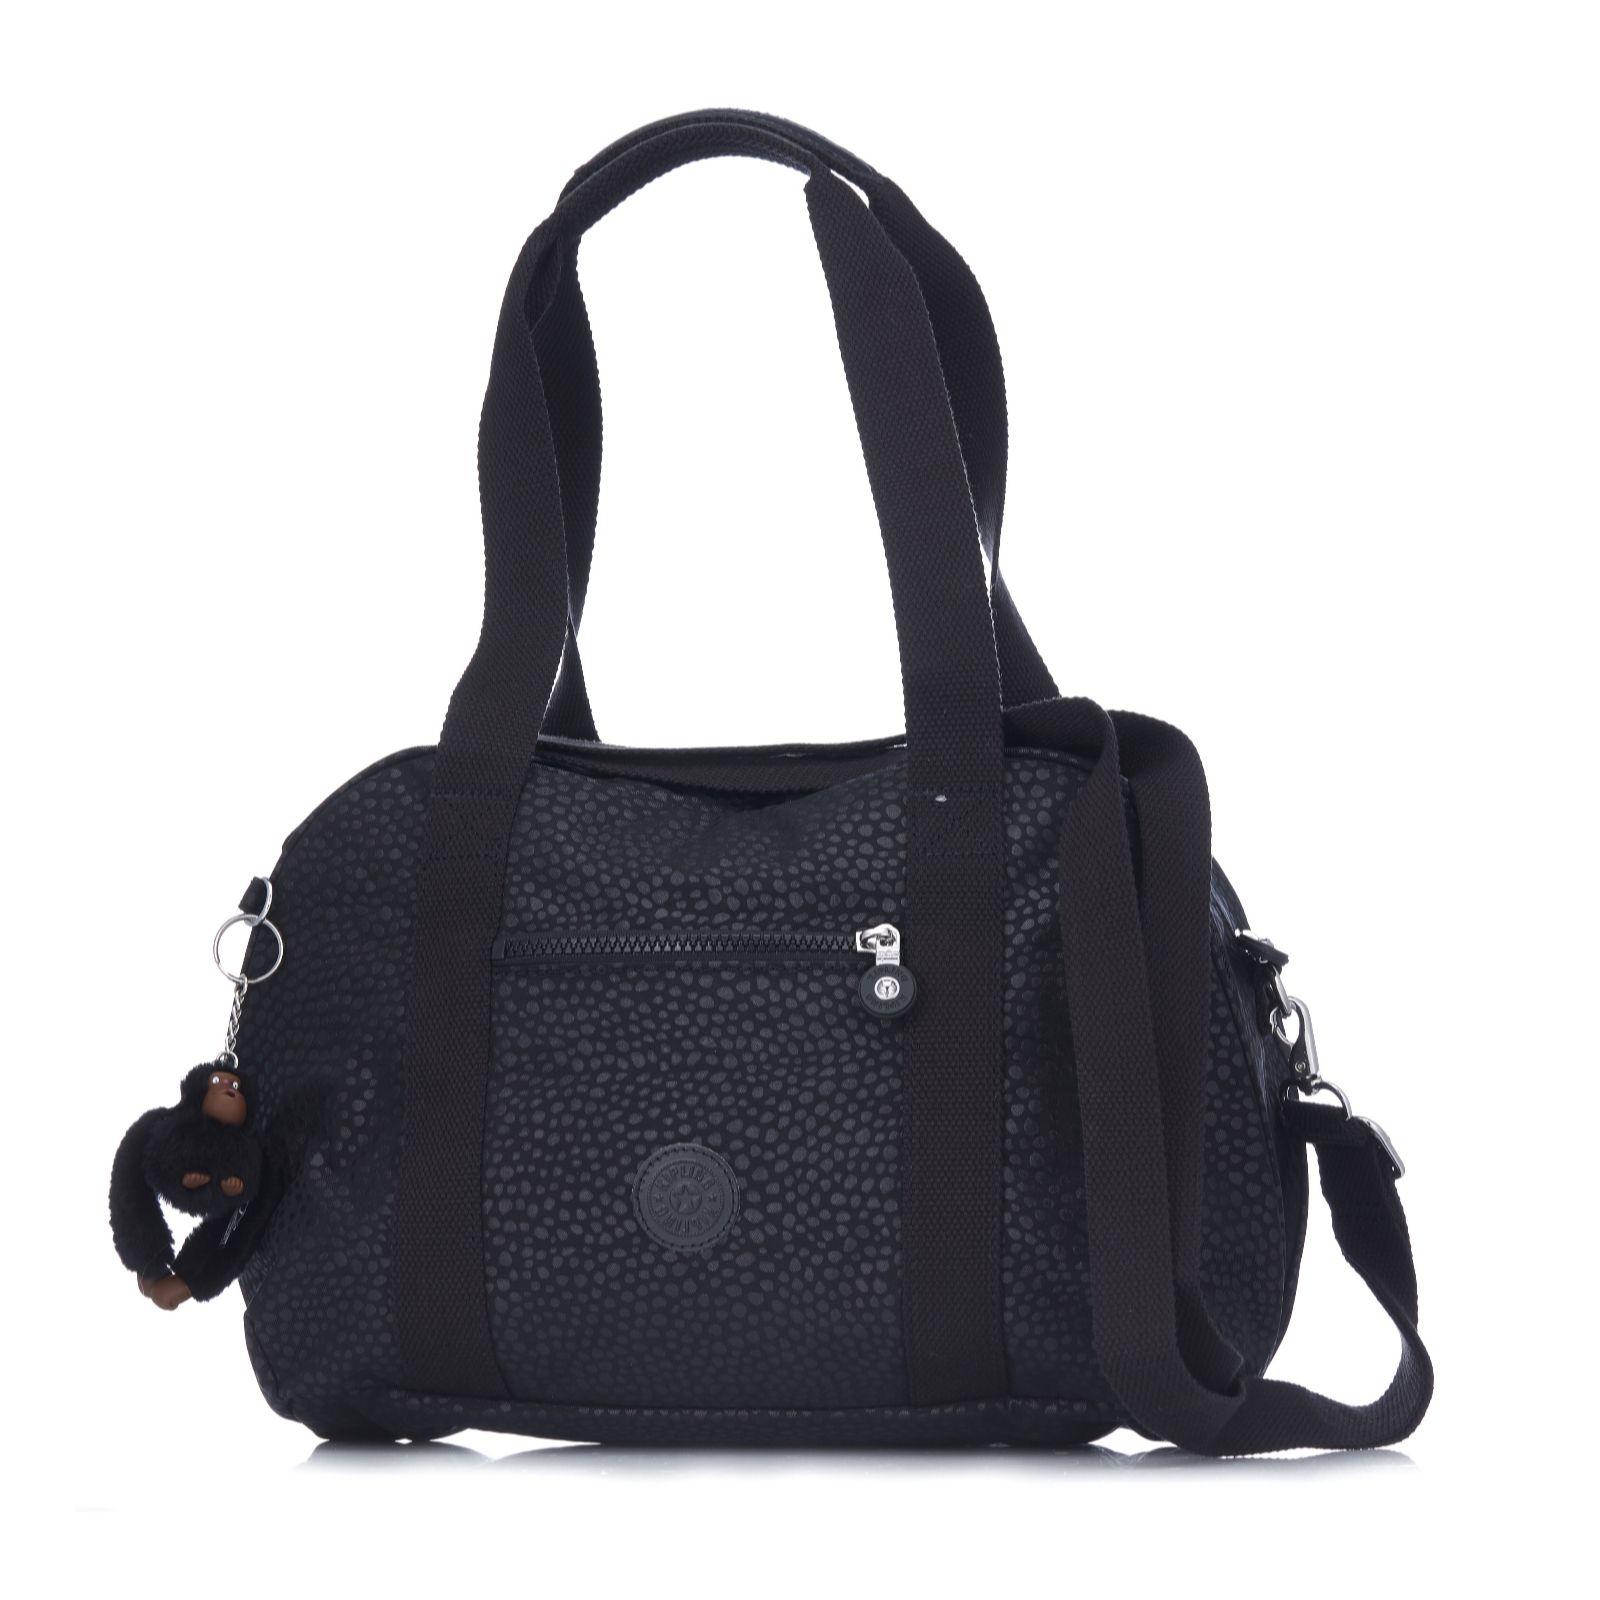 Kipling Lexique Premium Medium Shoulder Bag With